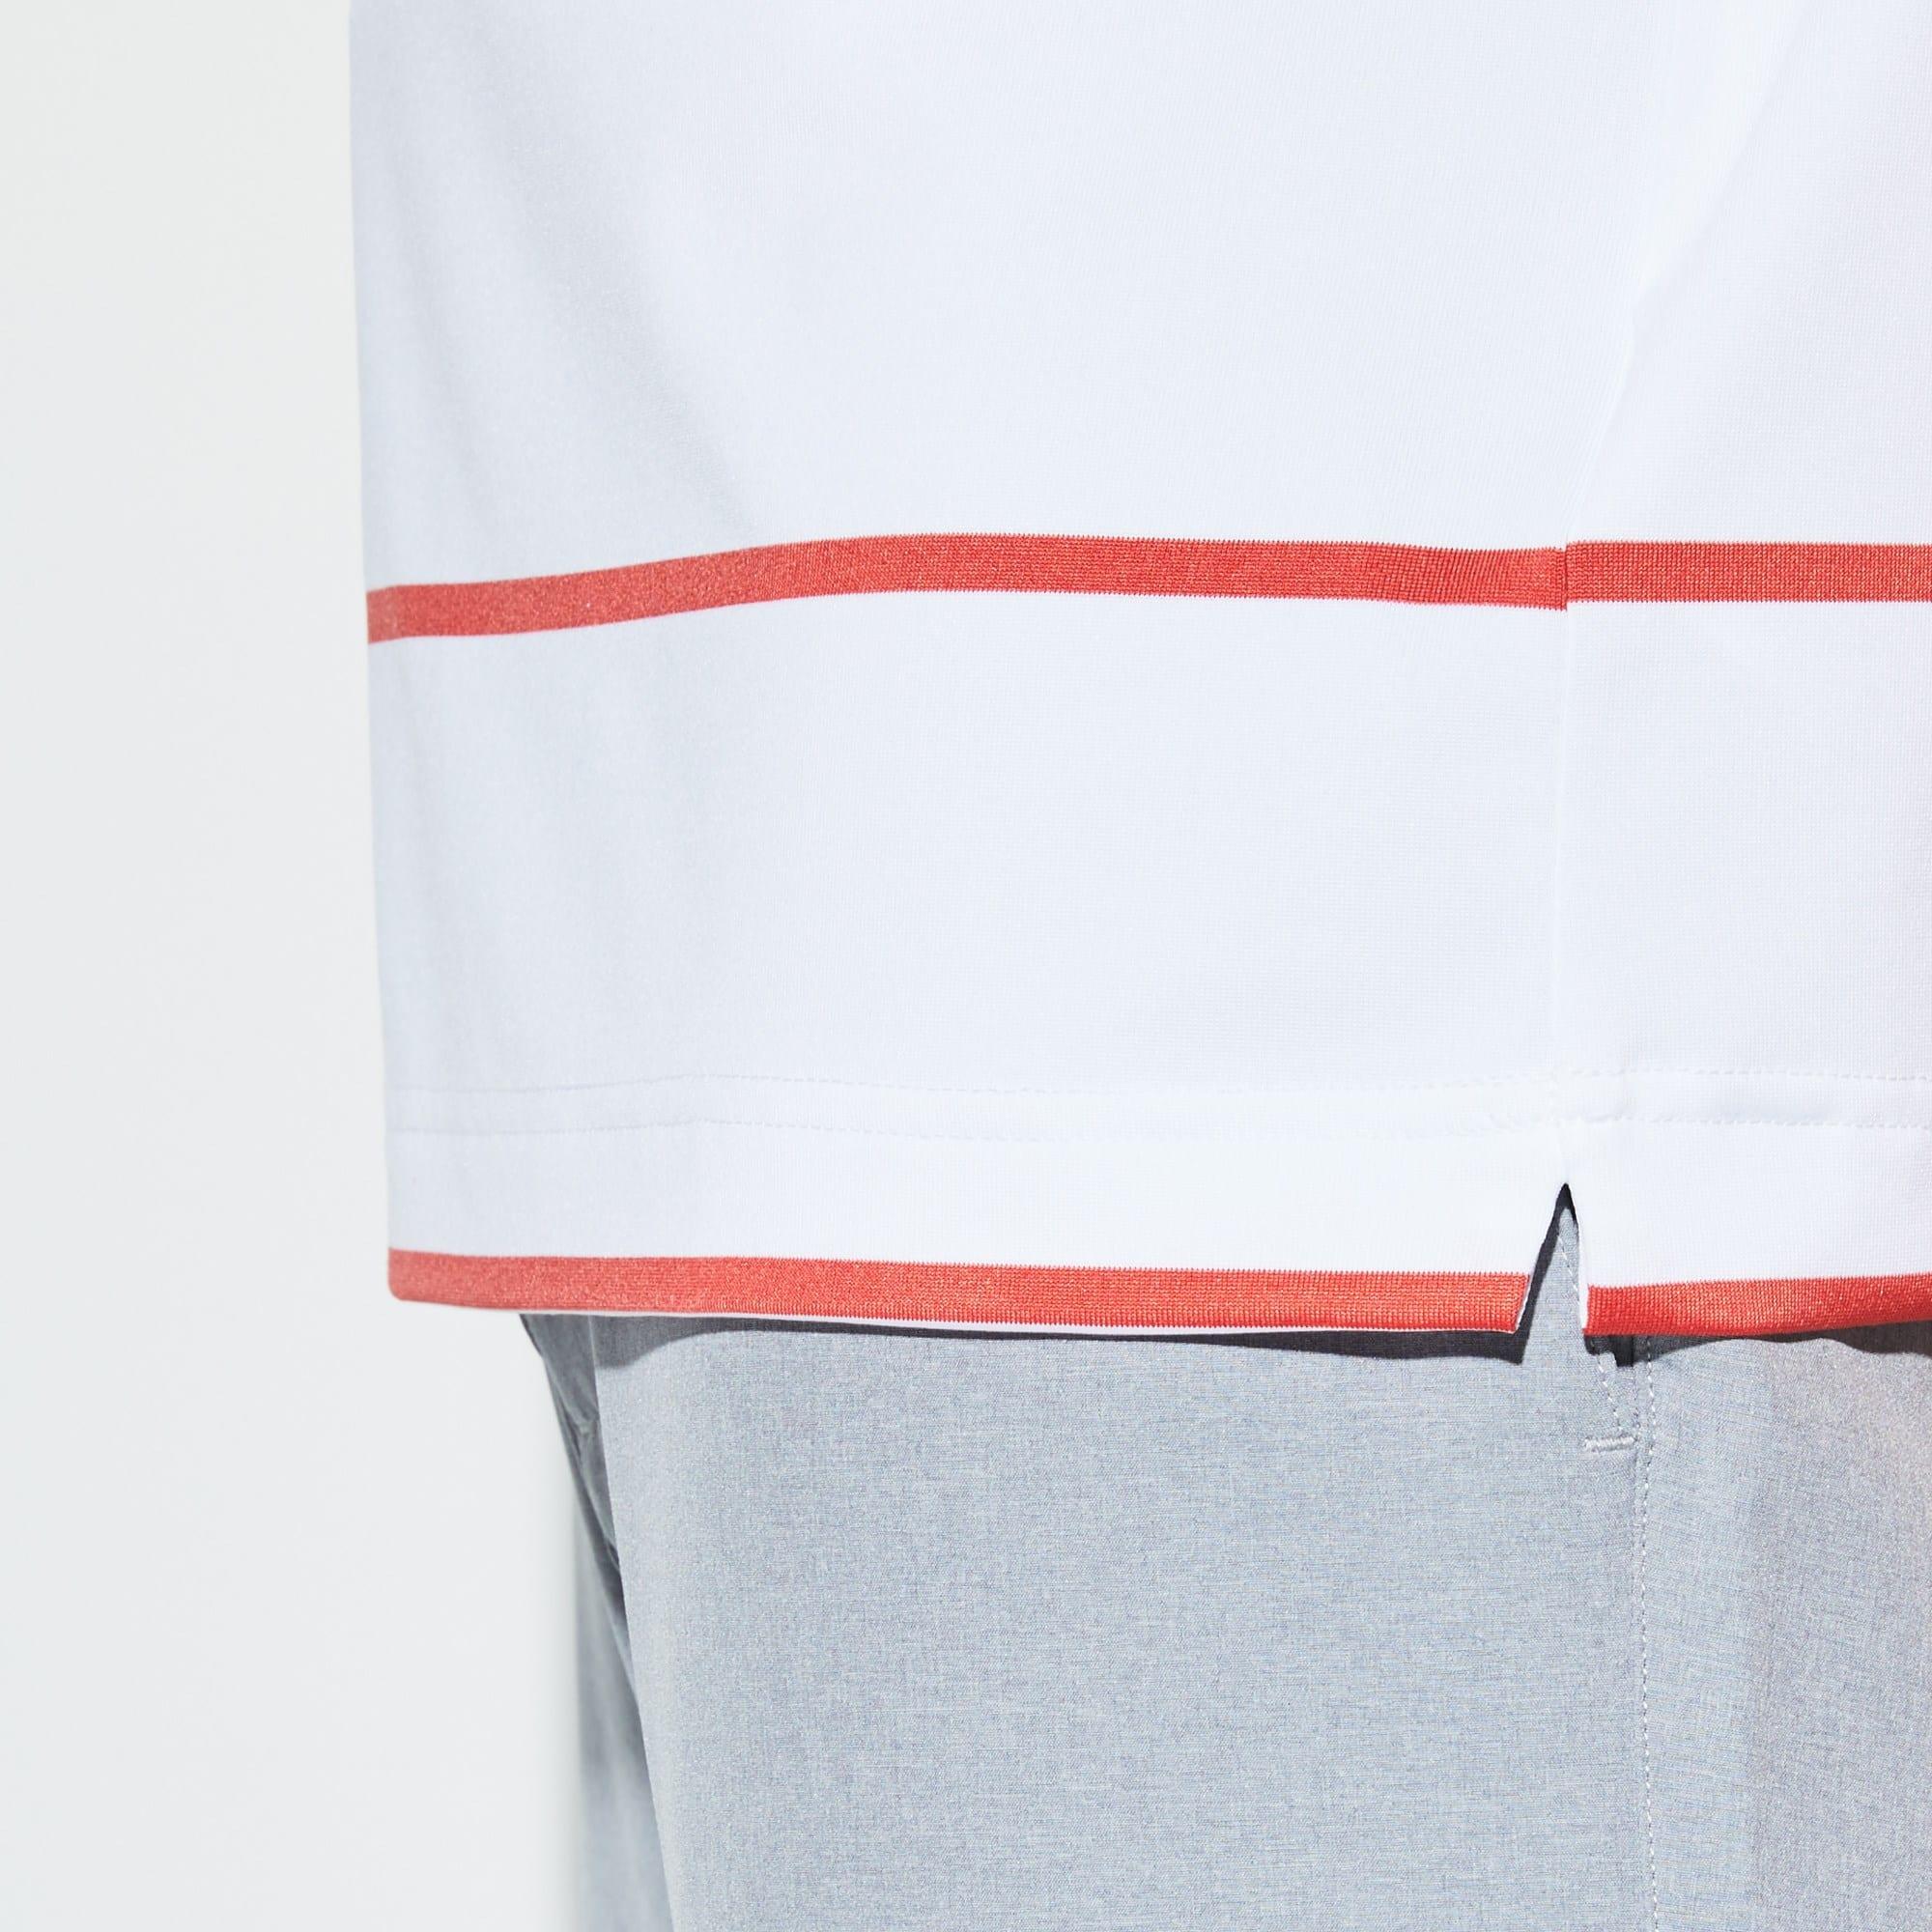 Lacoste - Herren LACOSTE SPORT Ryder Cup Edition gestreiftes Poloshirt - 5